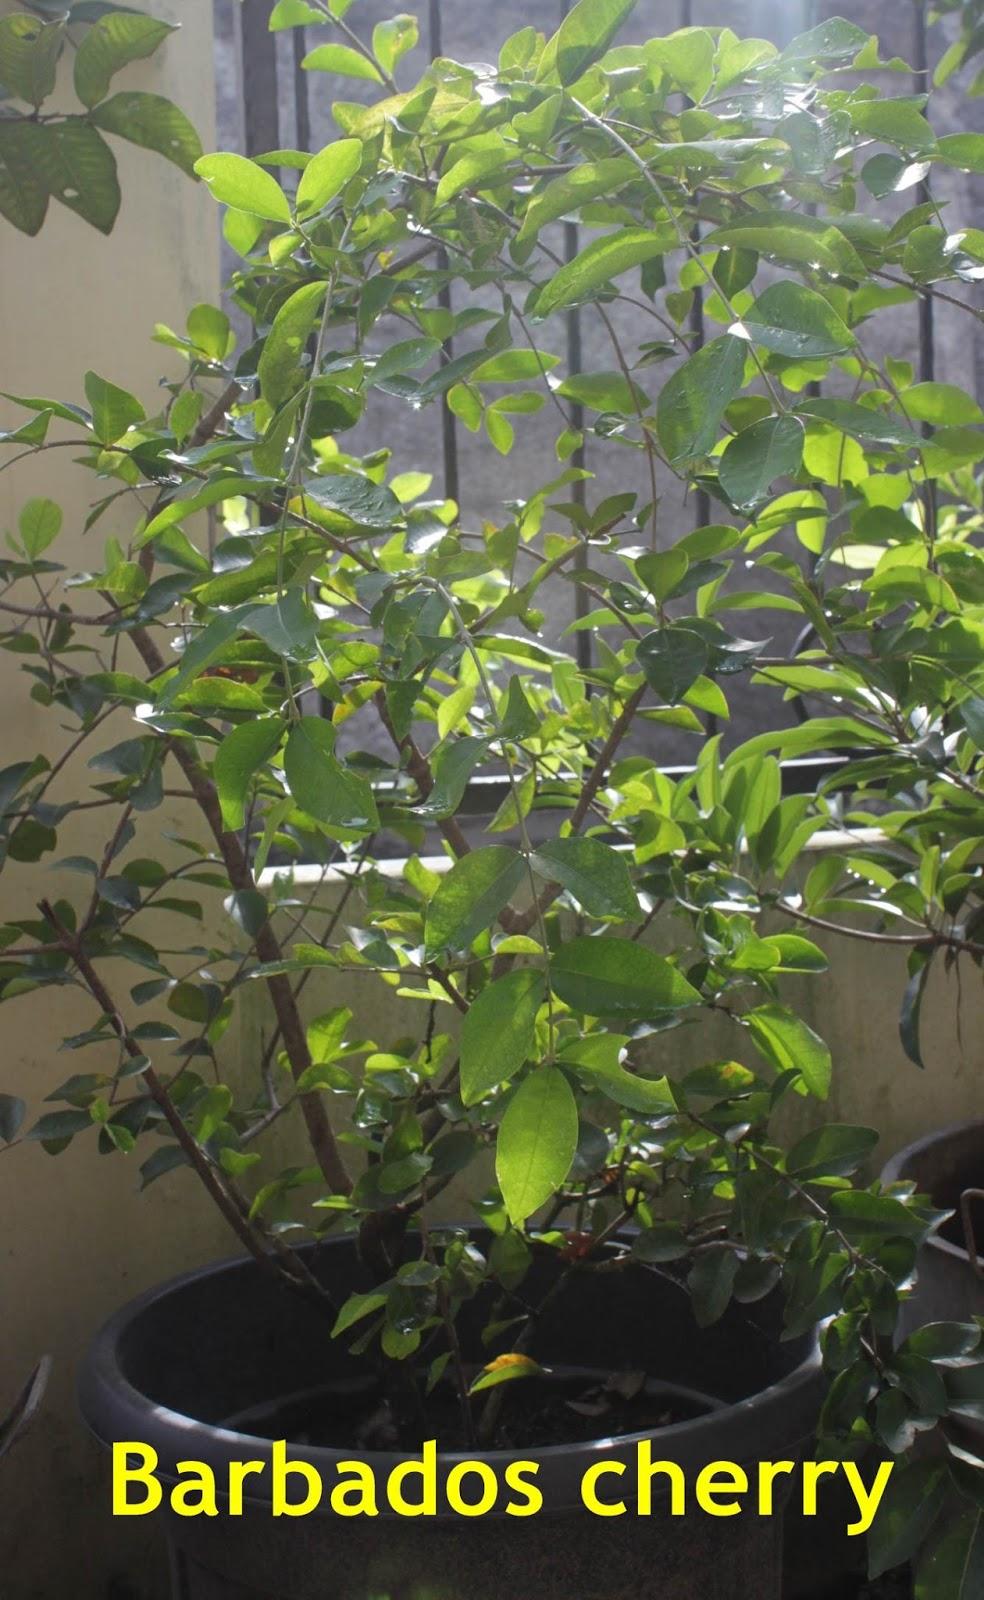 CHERRY Jaboticaba Anggur Brazil Barbados Cherry Grumichama